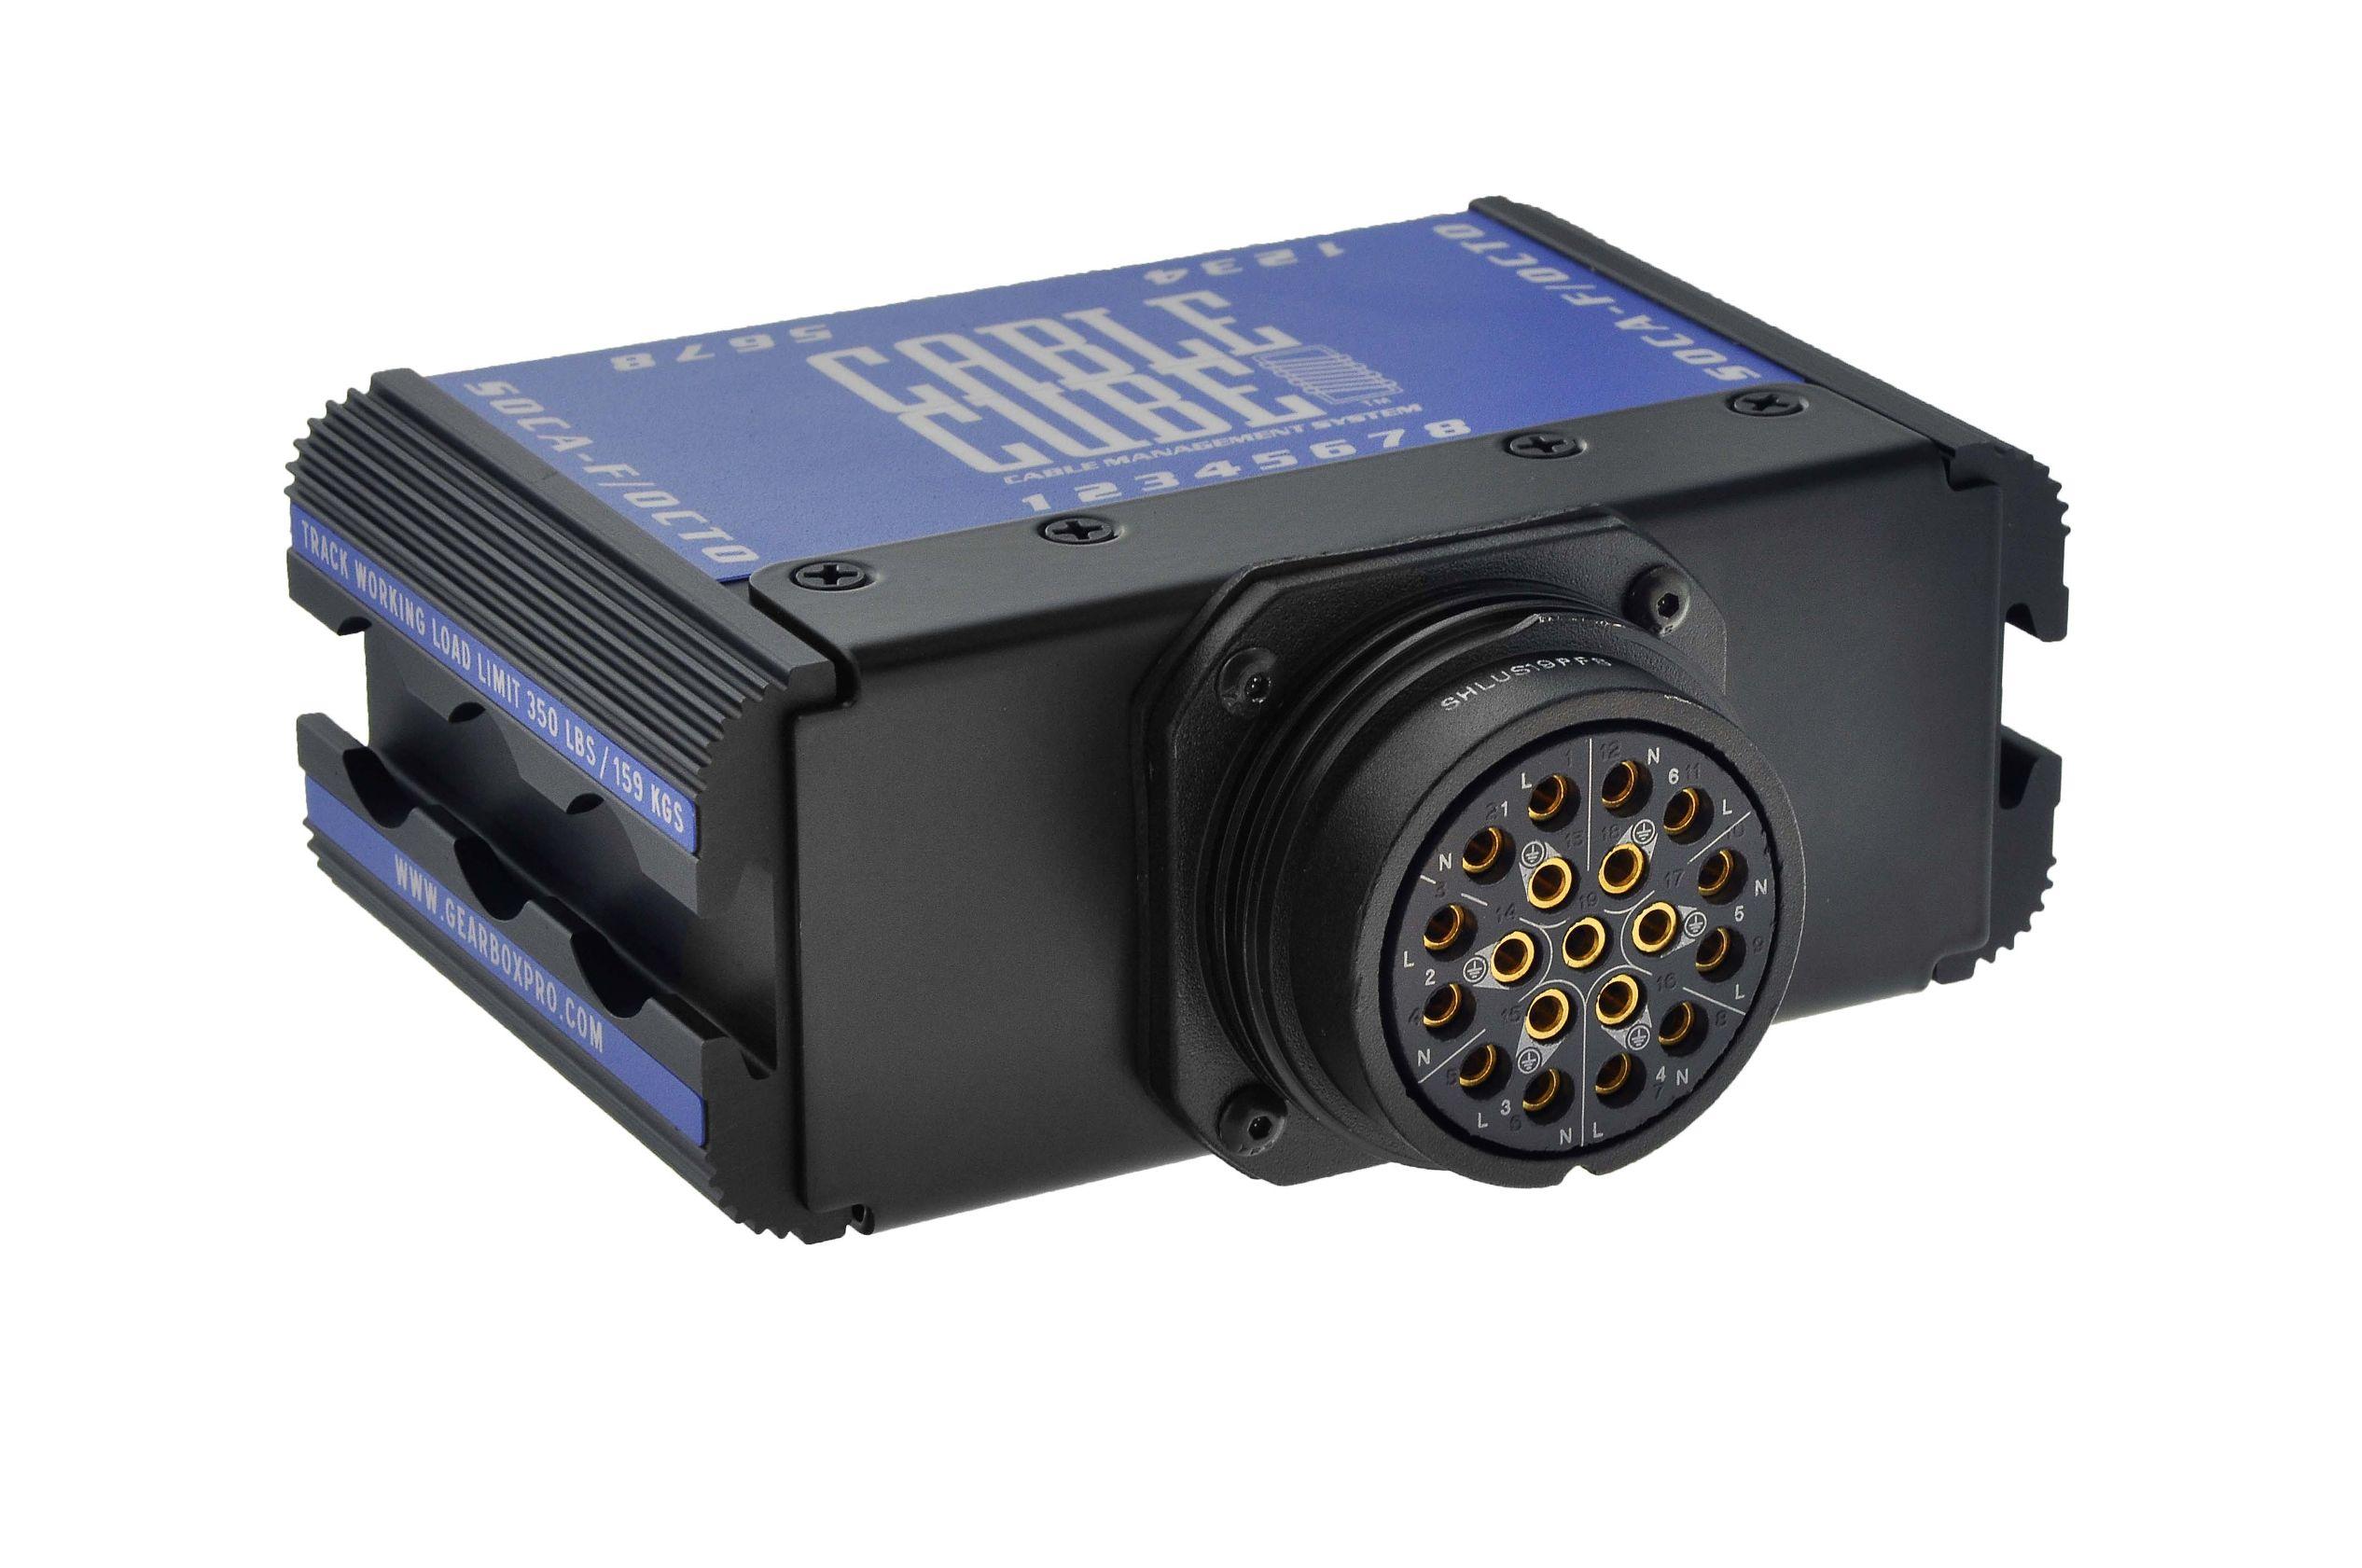 powercon wiring diagram 2006 gmc sierra stereo 3 5mm